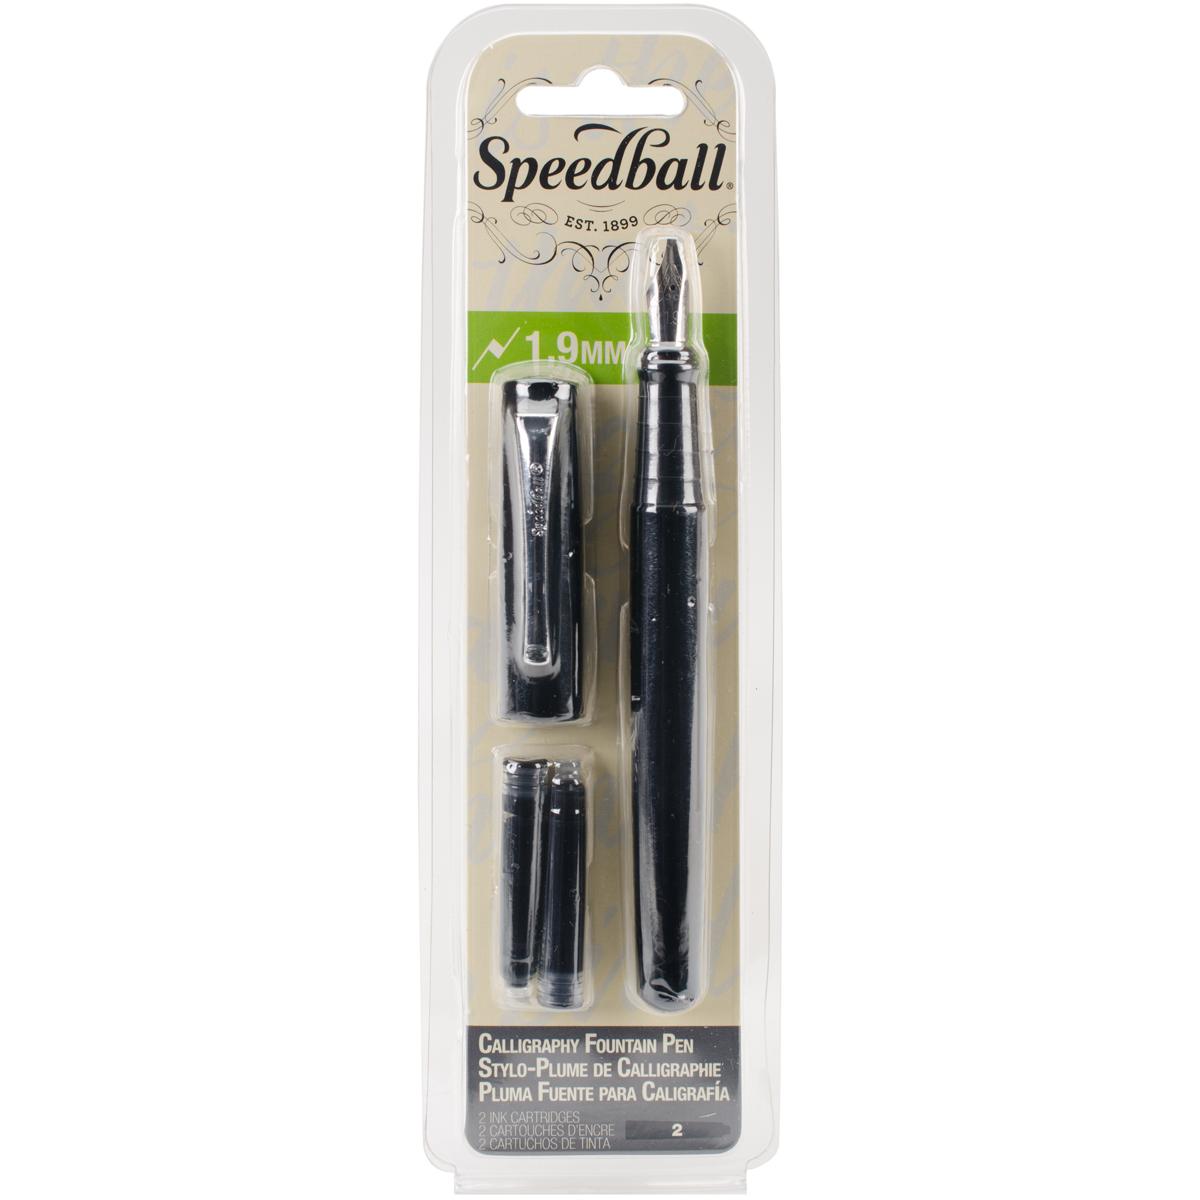 Speedball Calligraphy Fountain Pen 1.9mm Nib